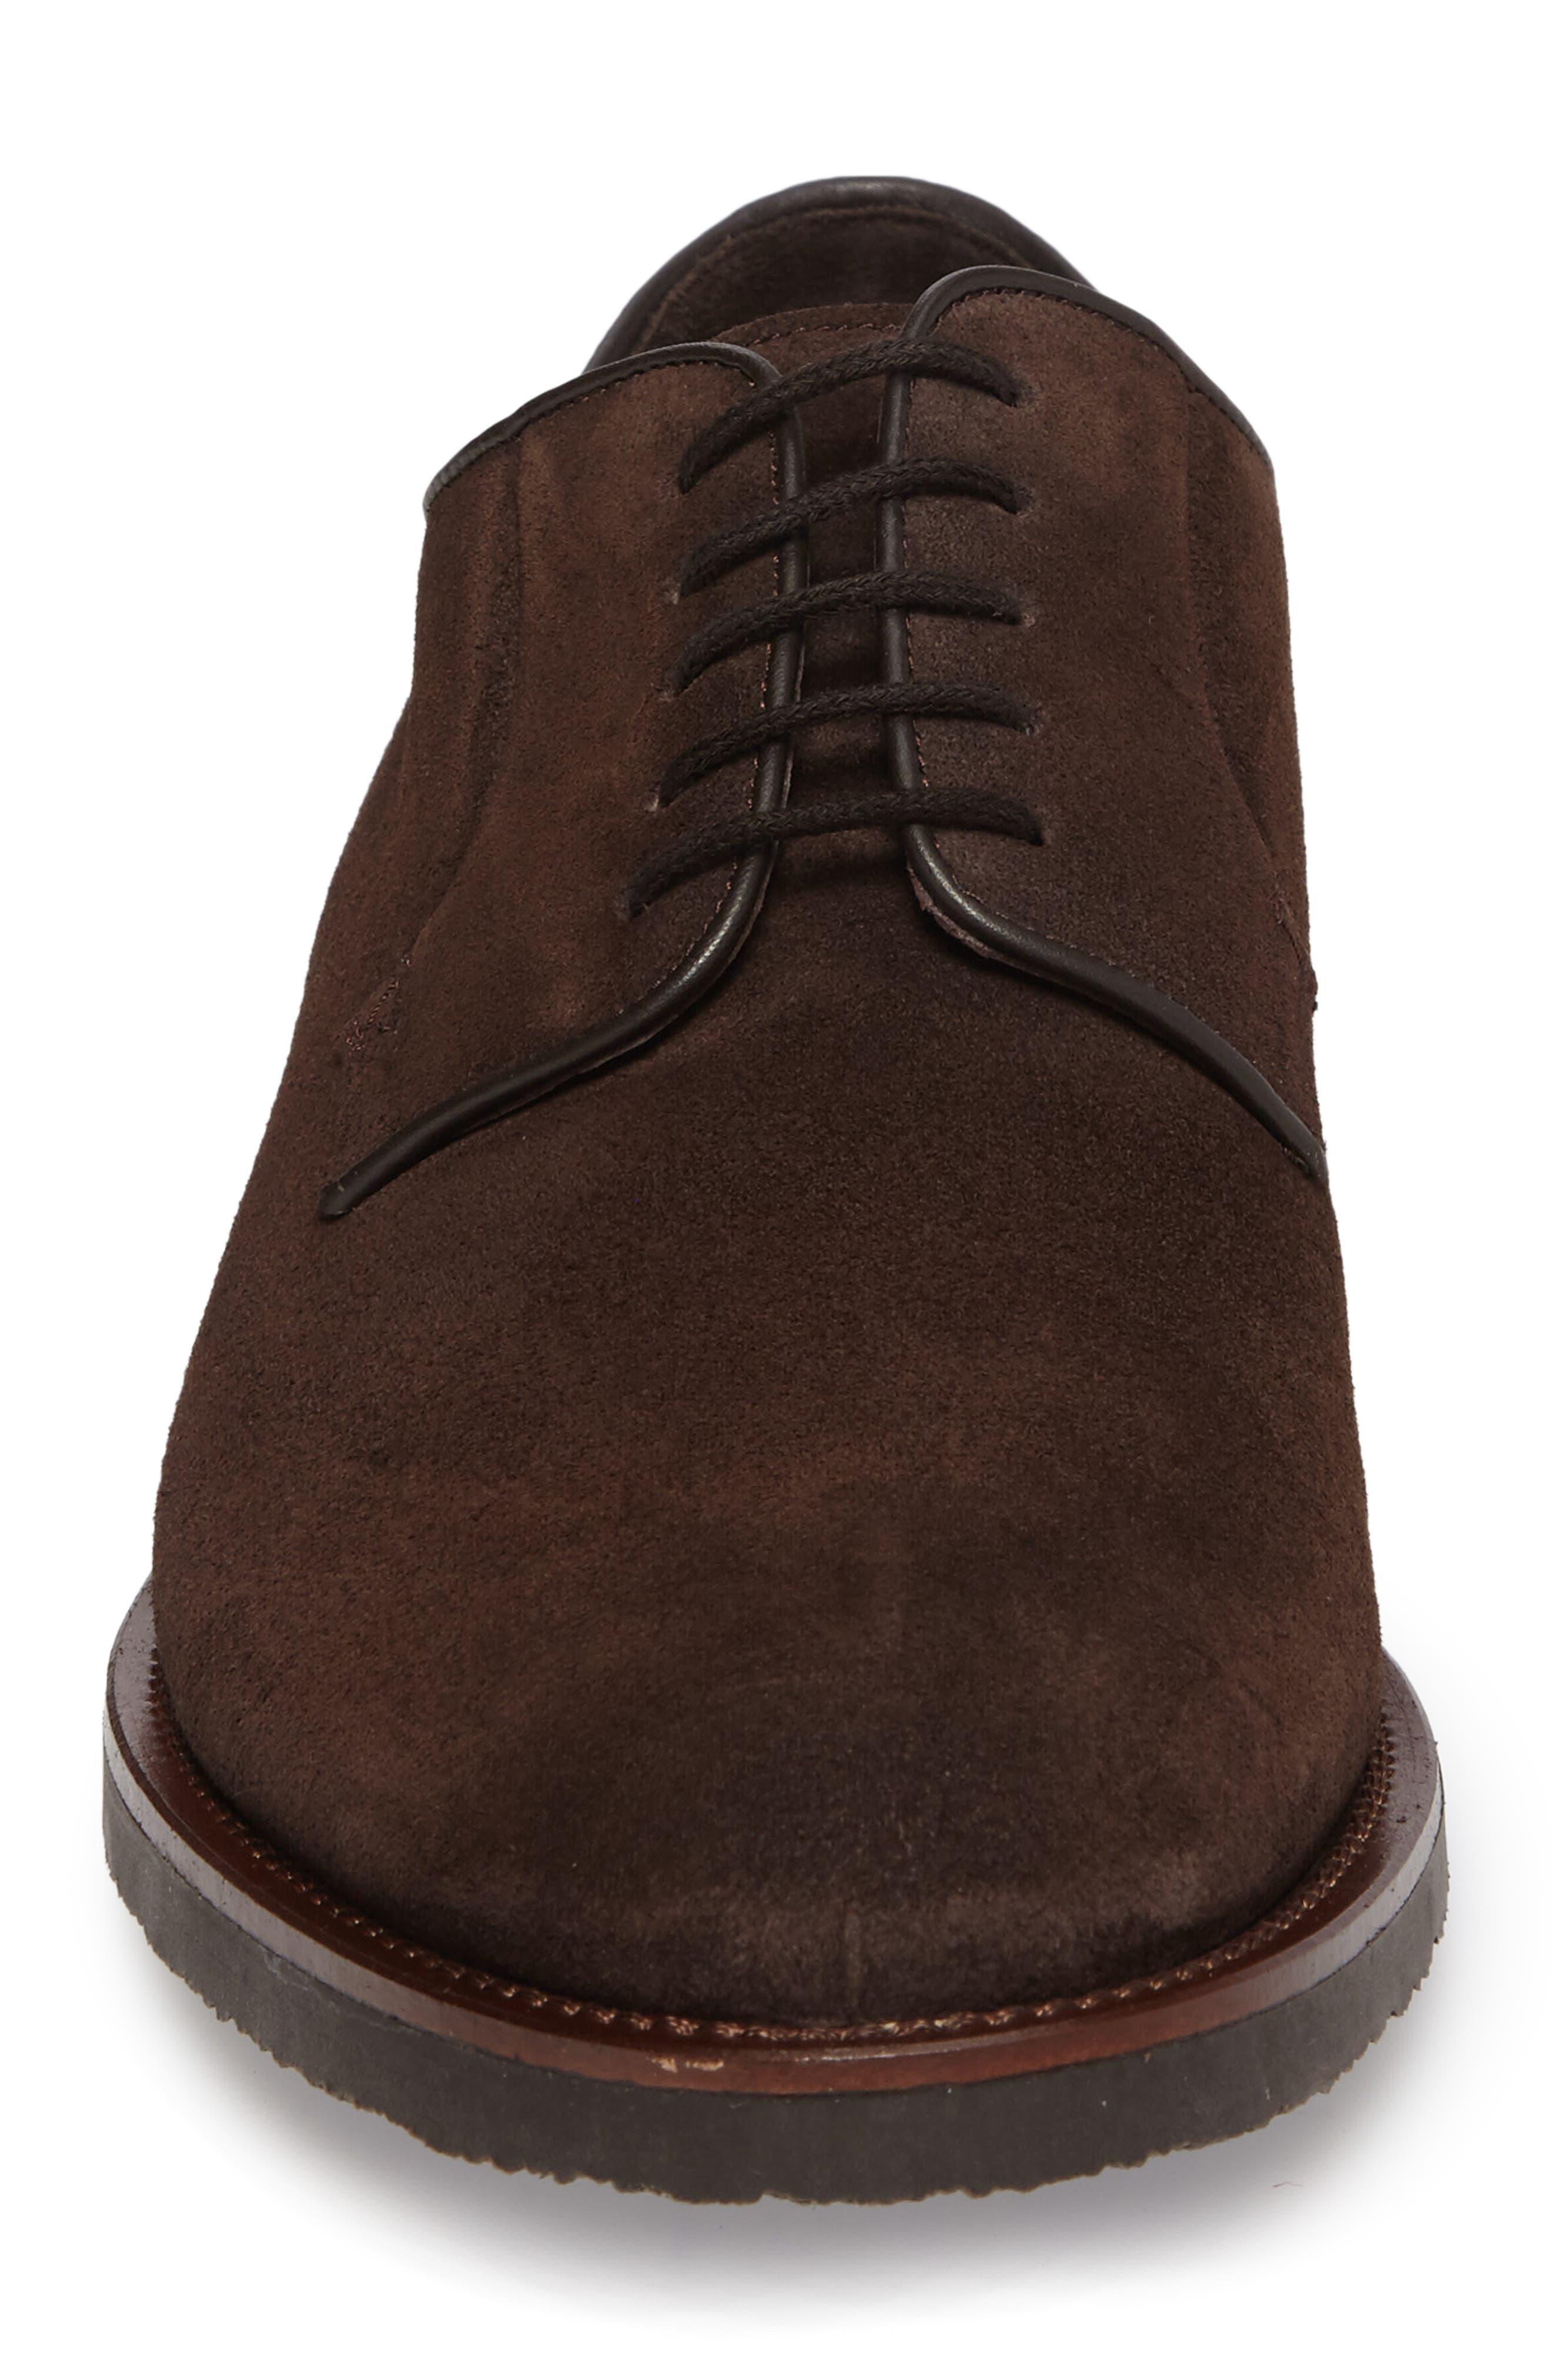 Samuel Plain-Toe Derby,                             Alternate thumbnail 4, color,                             Brown Suede Leather